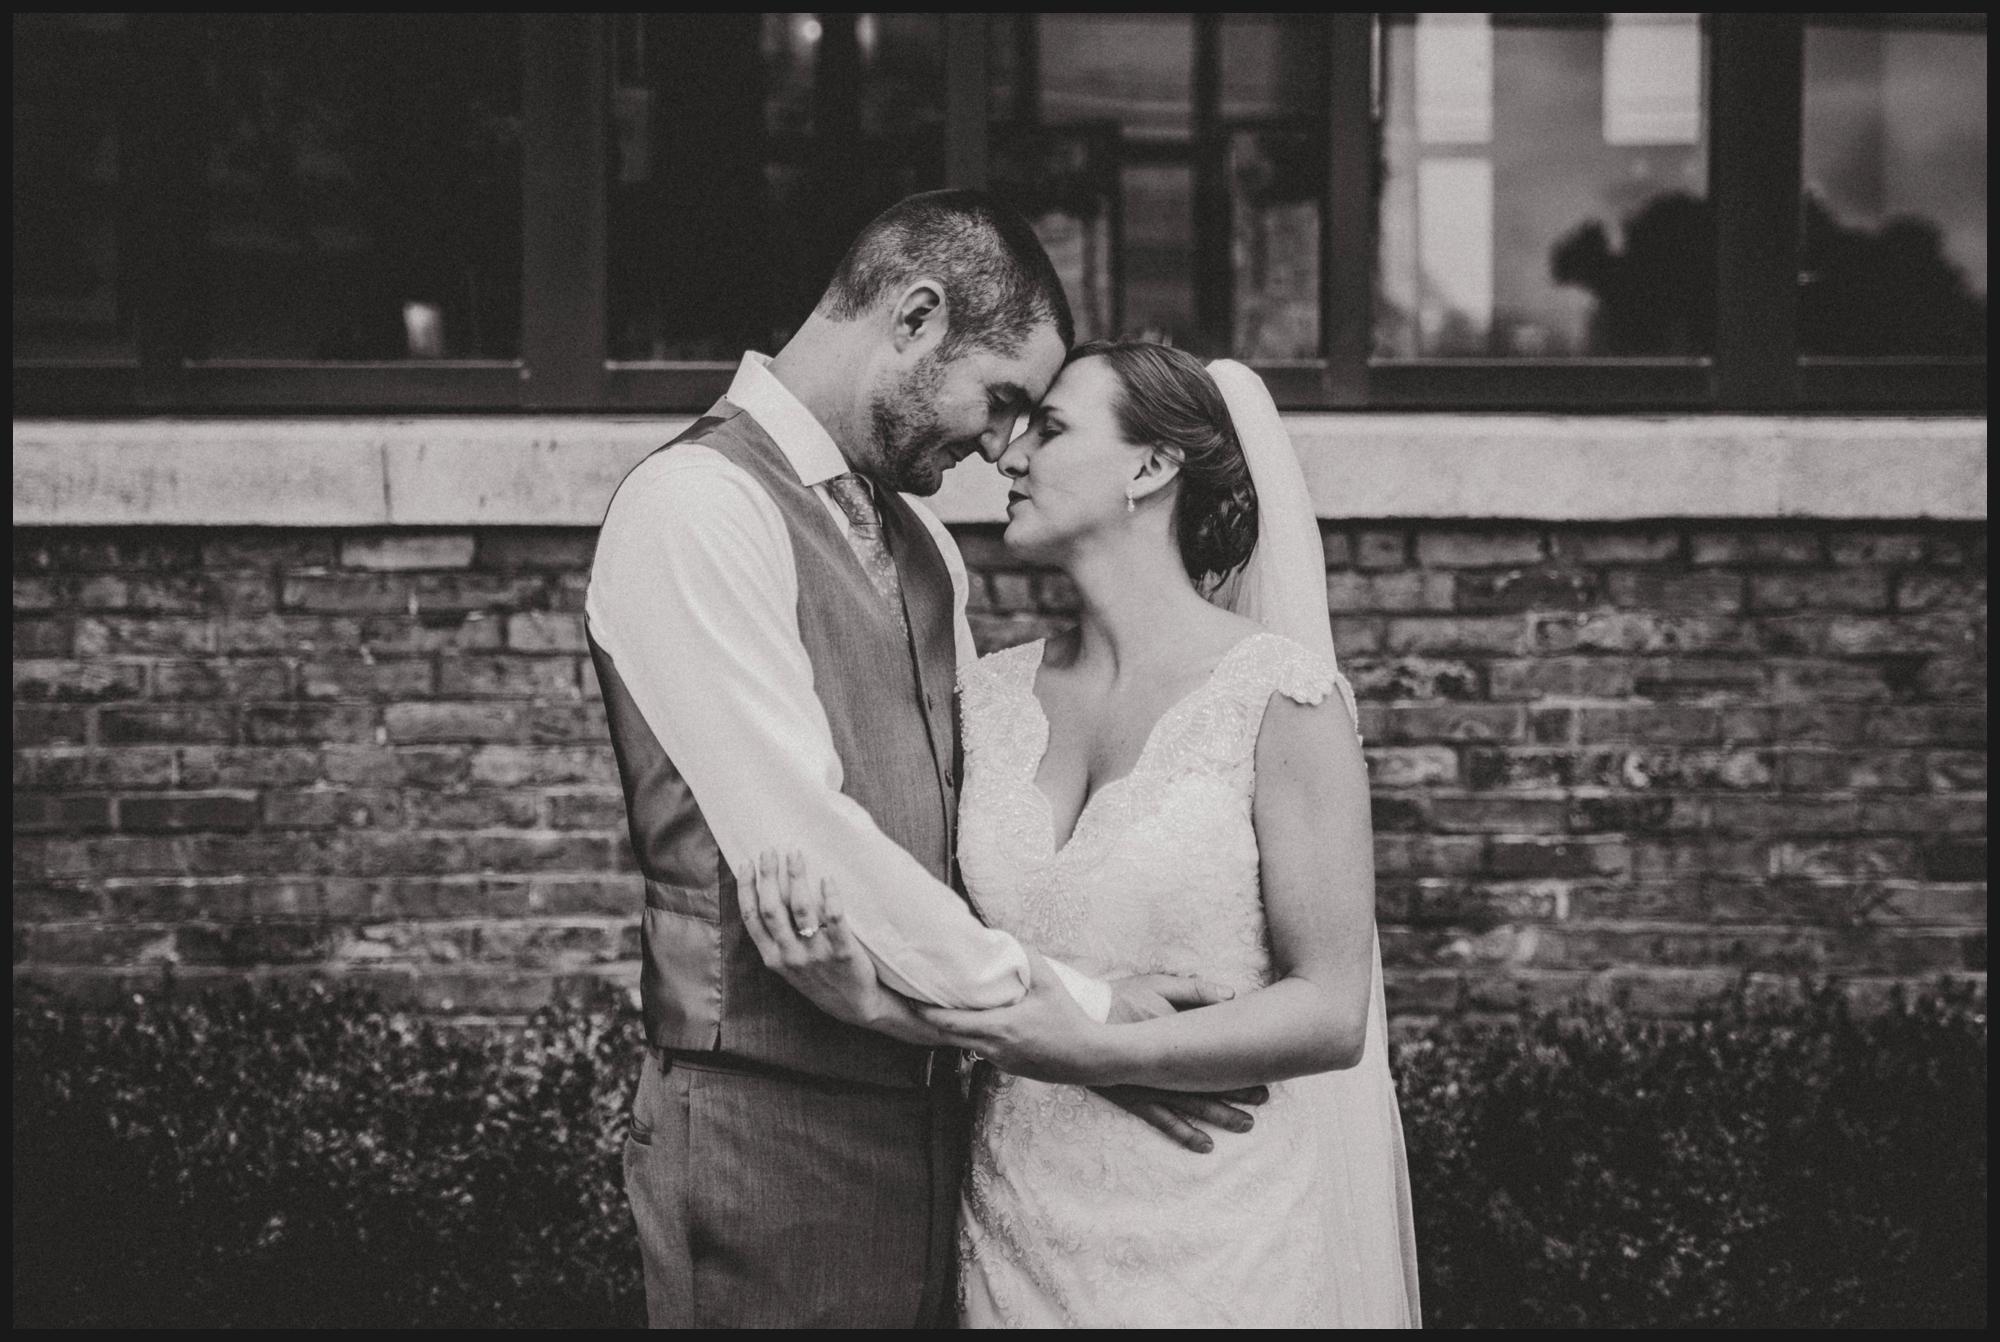 Orlando-Wedding-Photographer-destination-wedding-photographer-florida-wedding-photographer-bohemian-wedding-photographer_0644.jpg